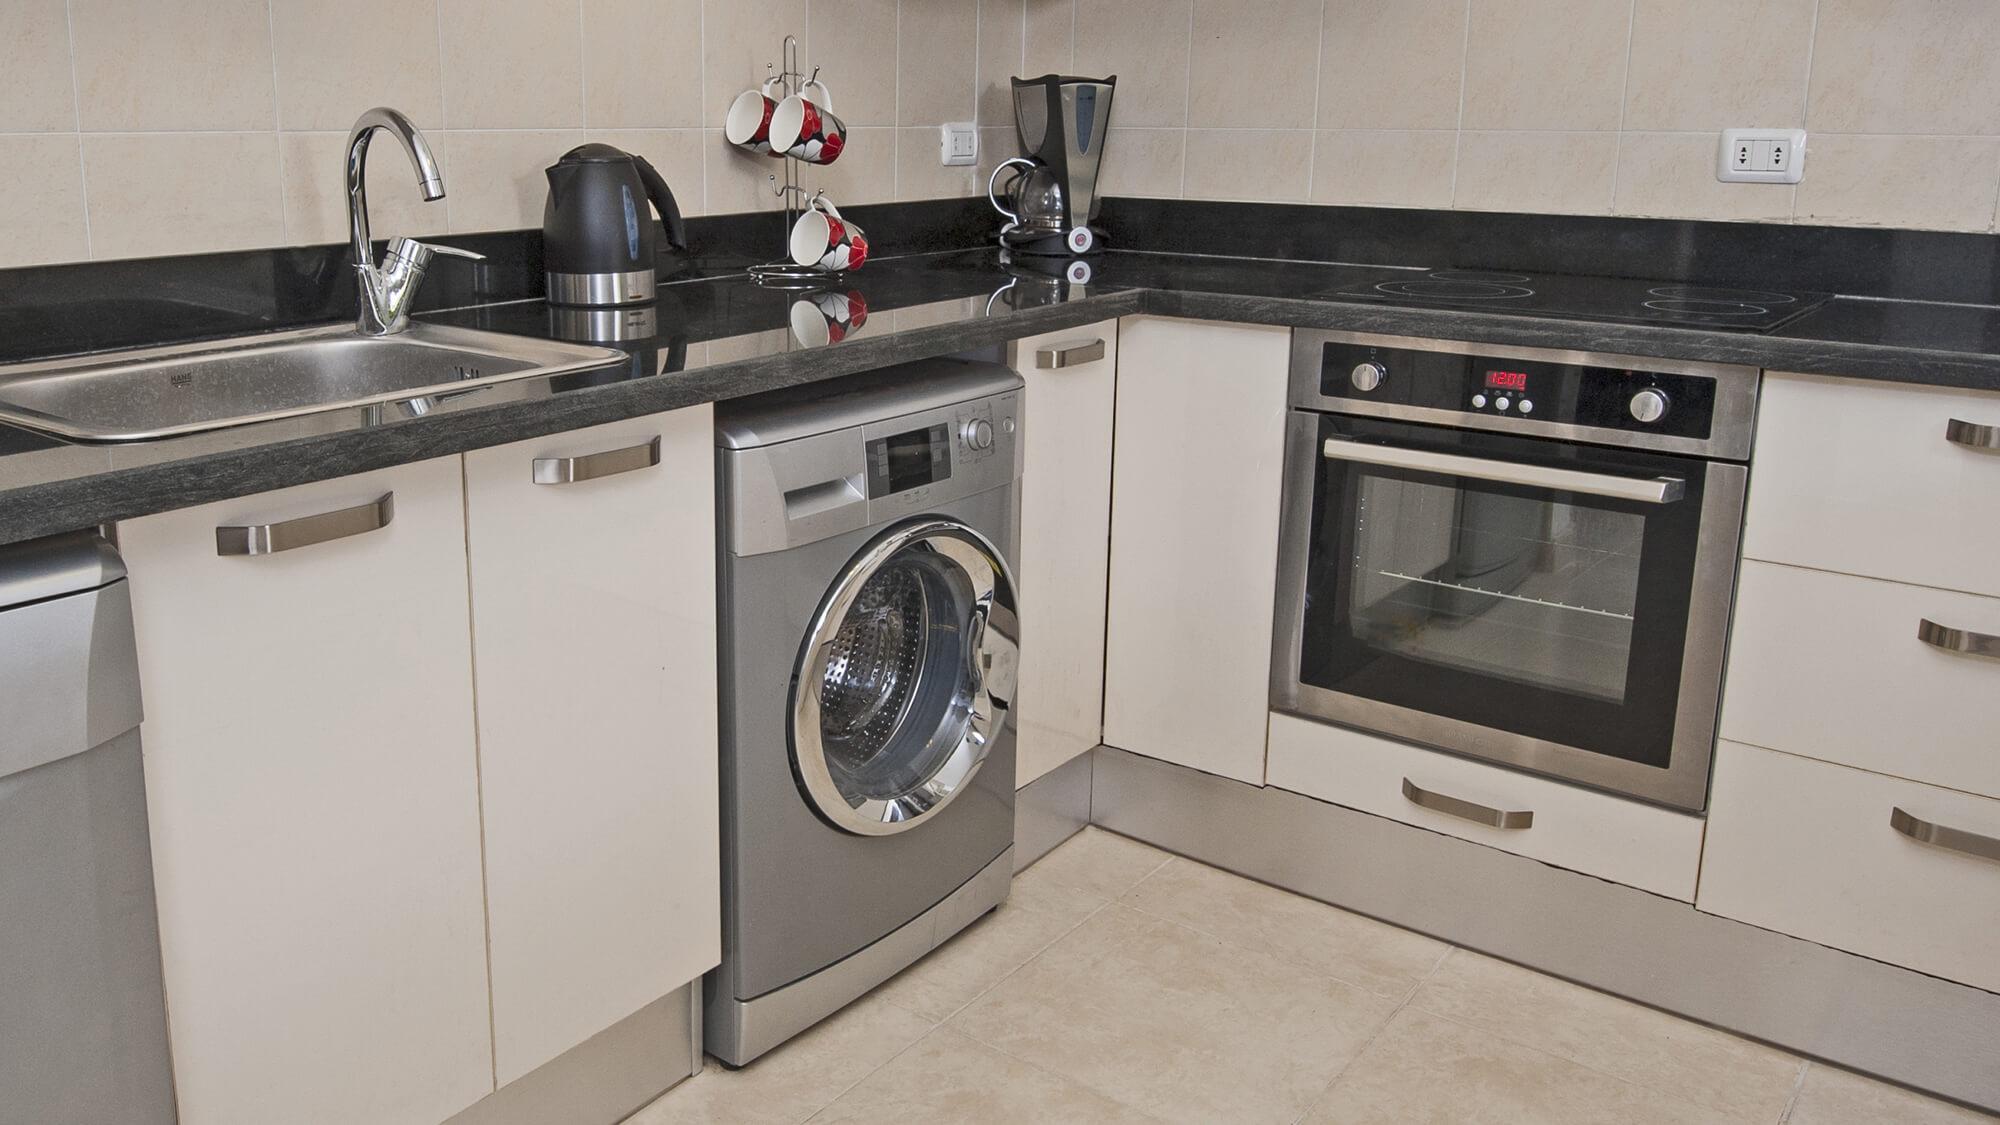 Freestanding tumble dryers Measurement guide